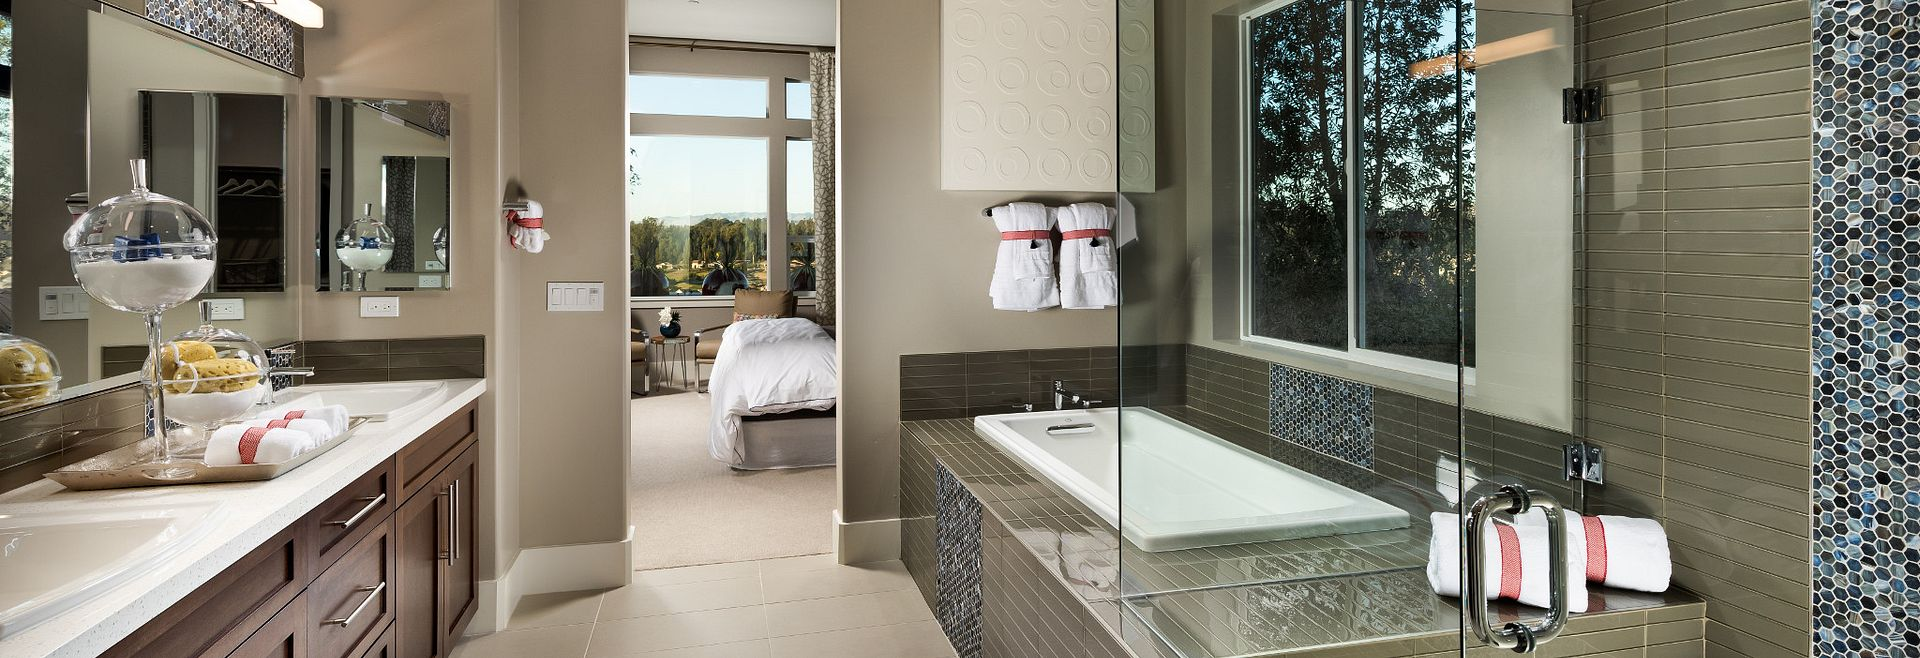 Trilogy Monarch Dunes Albariño Master Bathroom